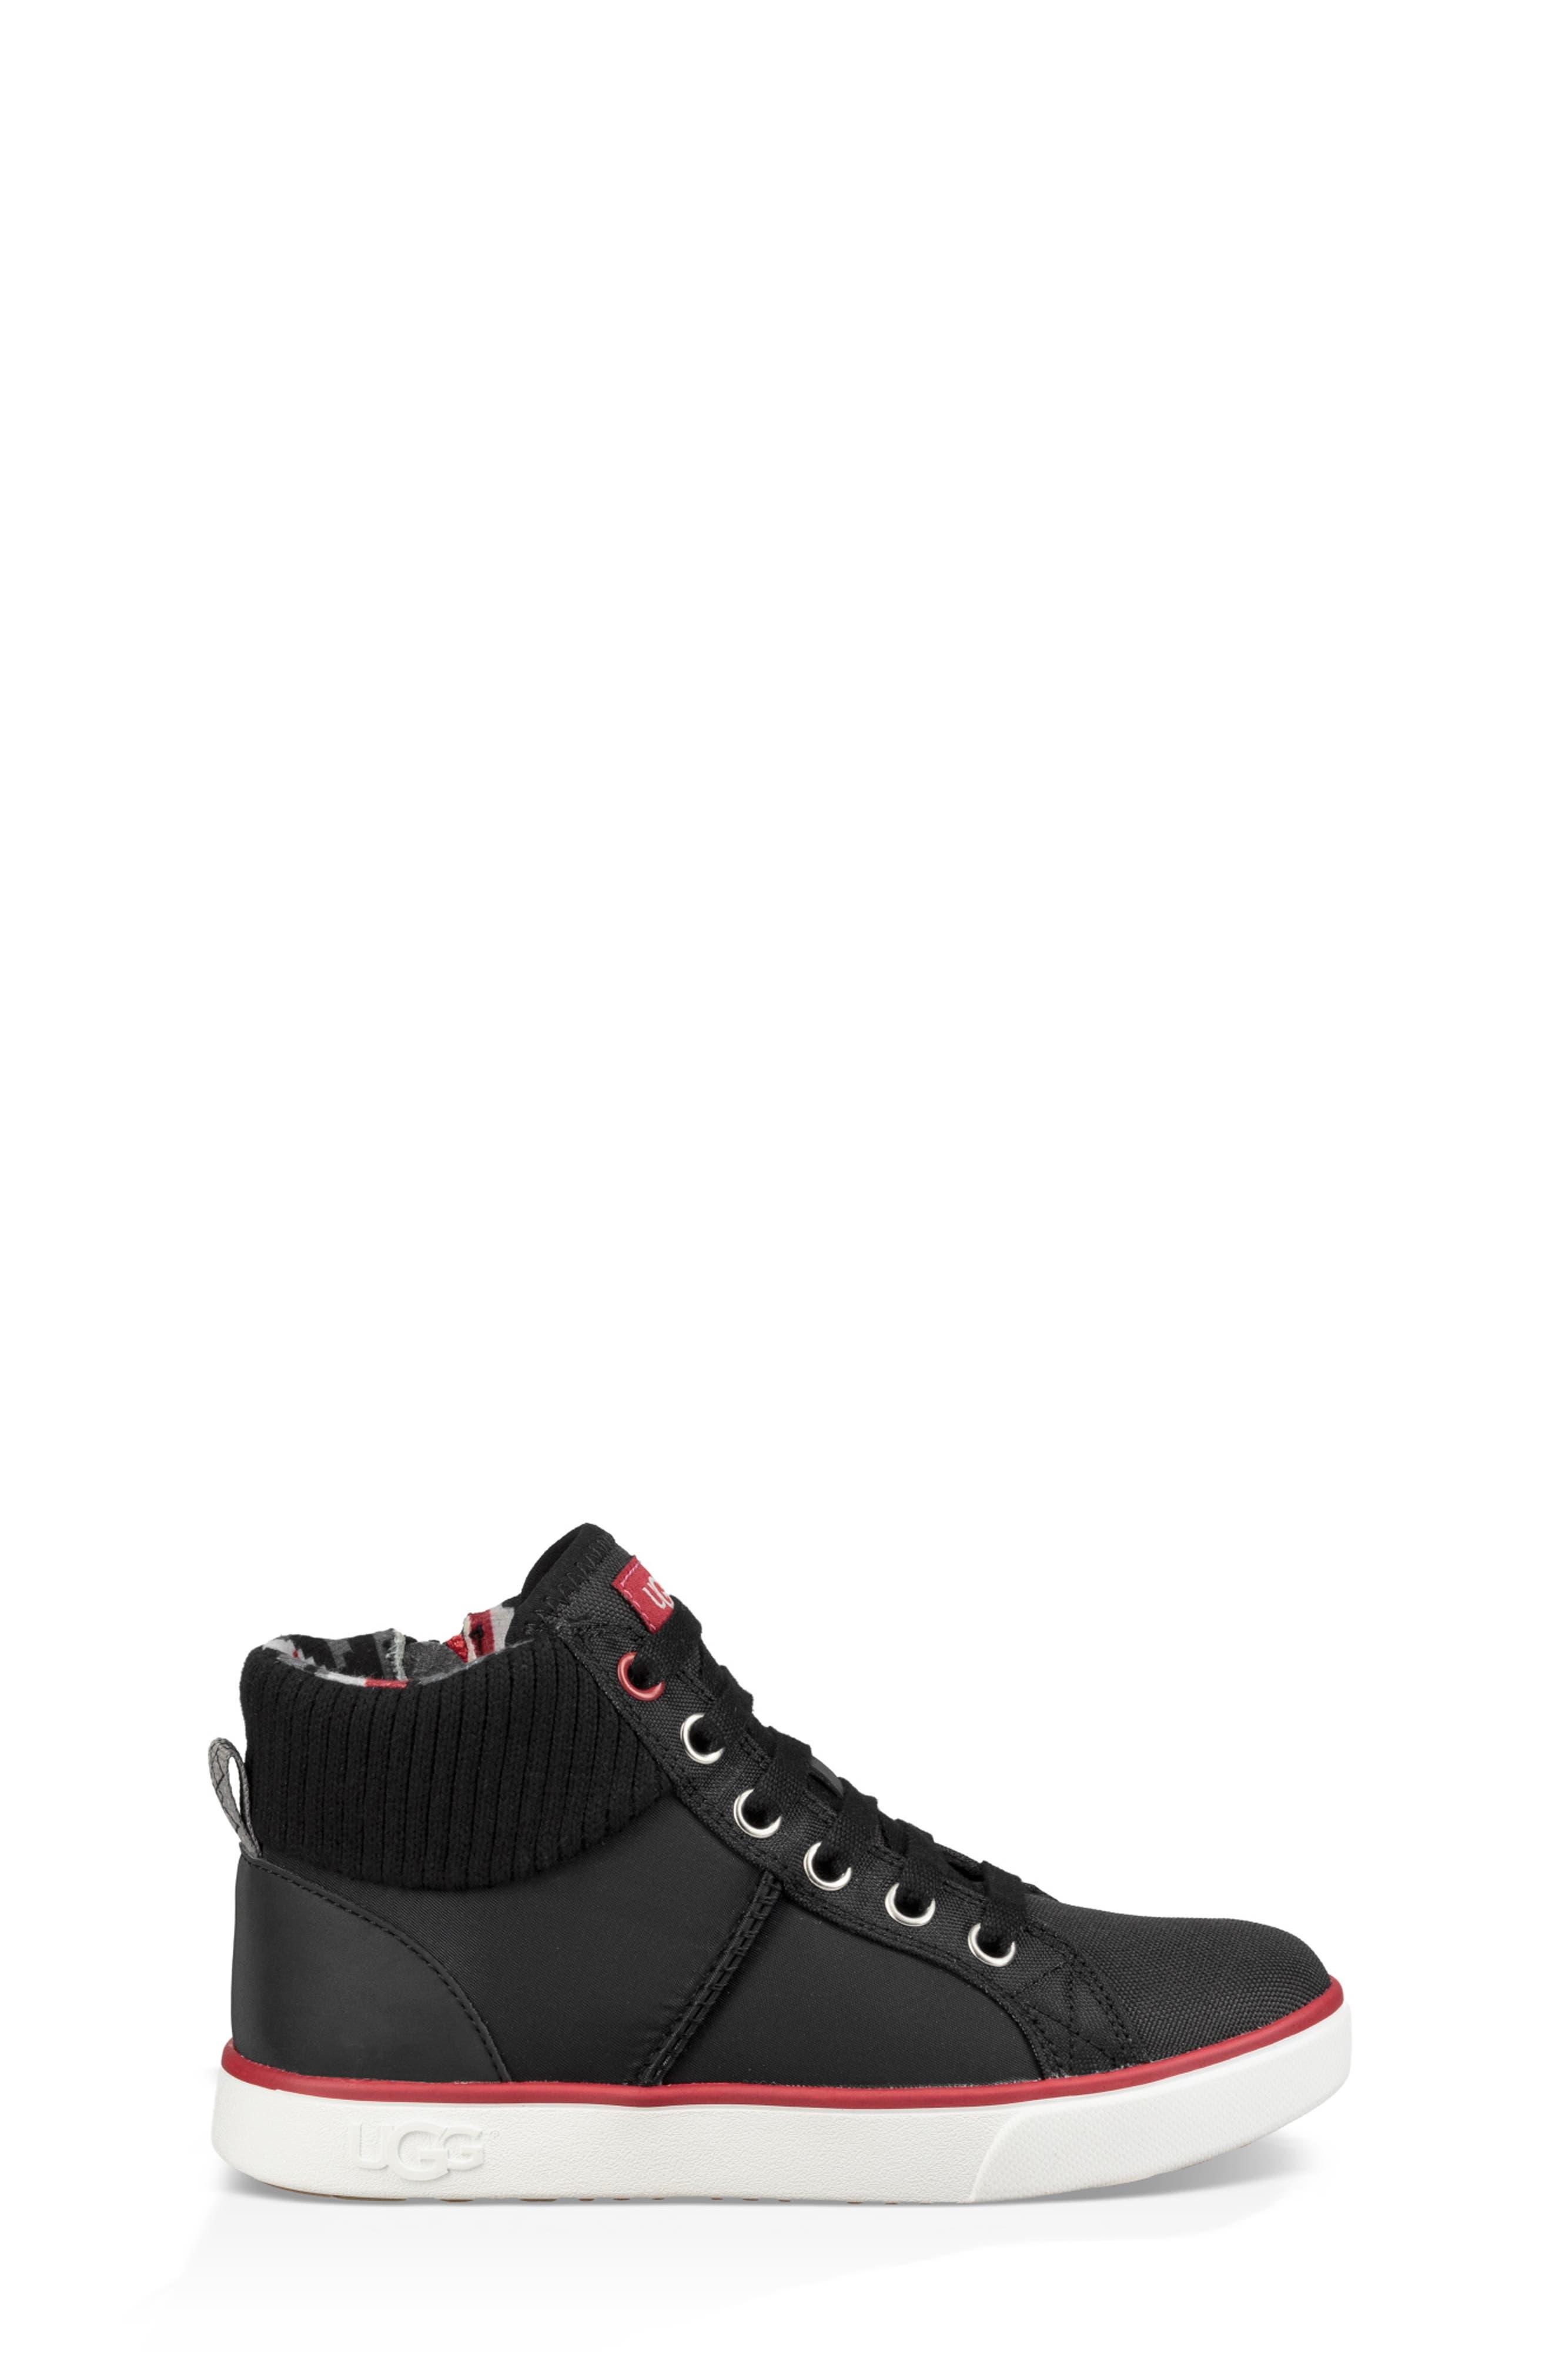 UGG<SUP>®</SUP>, Boscoe Sneaker, Alternate thumbnail 3, color, 001